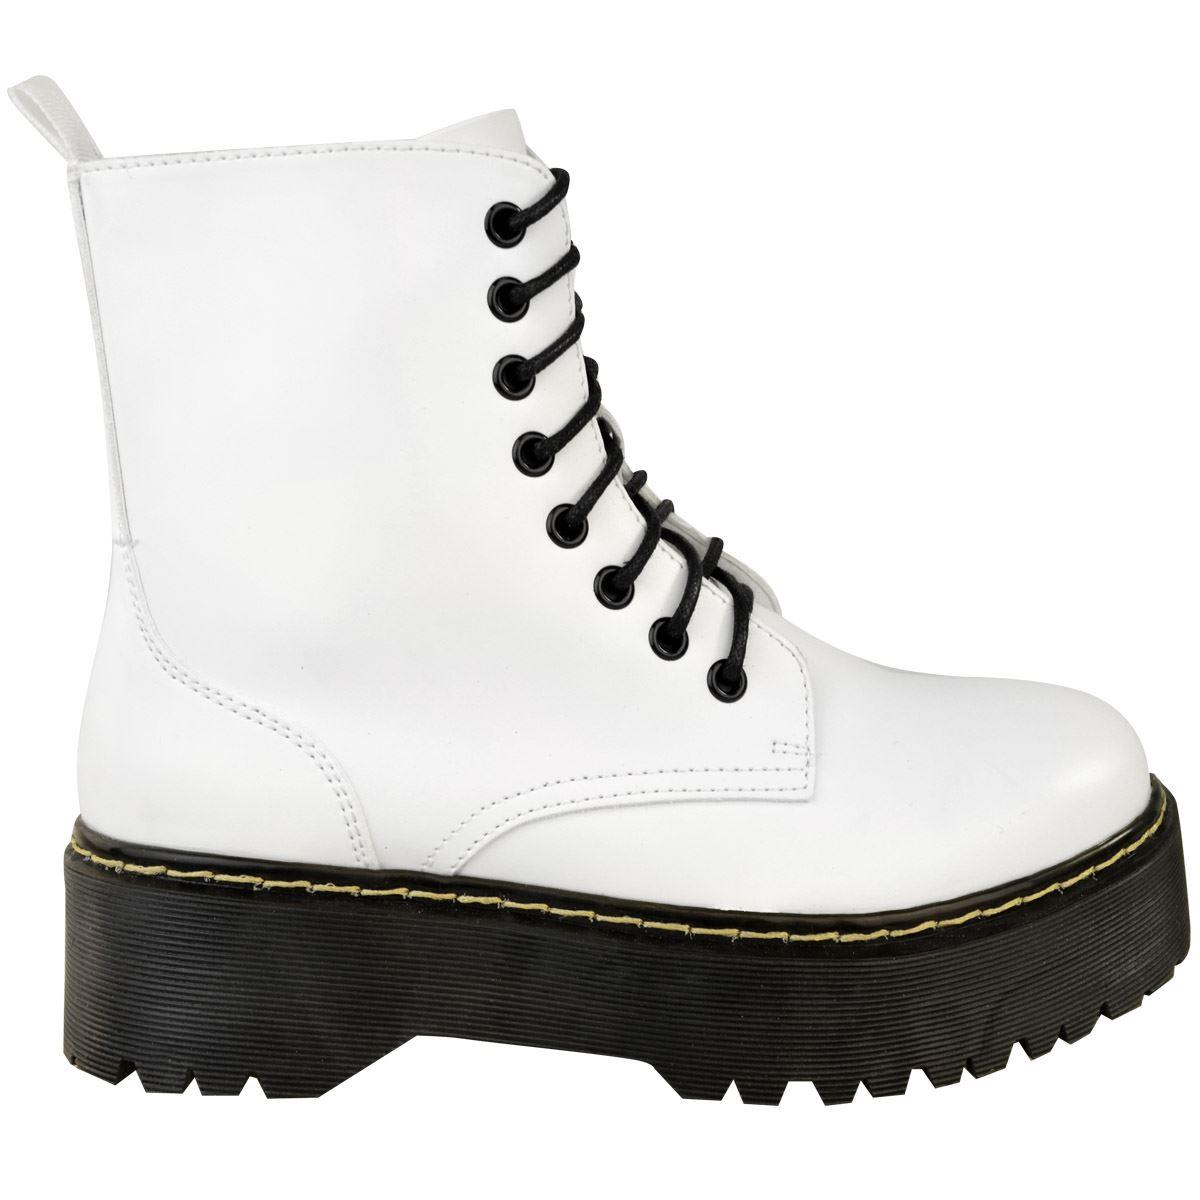 Womens-Ladies-Chunky-Lace-Up-Ankle-Boots-Platform-Icon-Retro-Goth-Punk-Black miniatuur 19